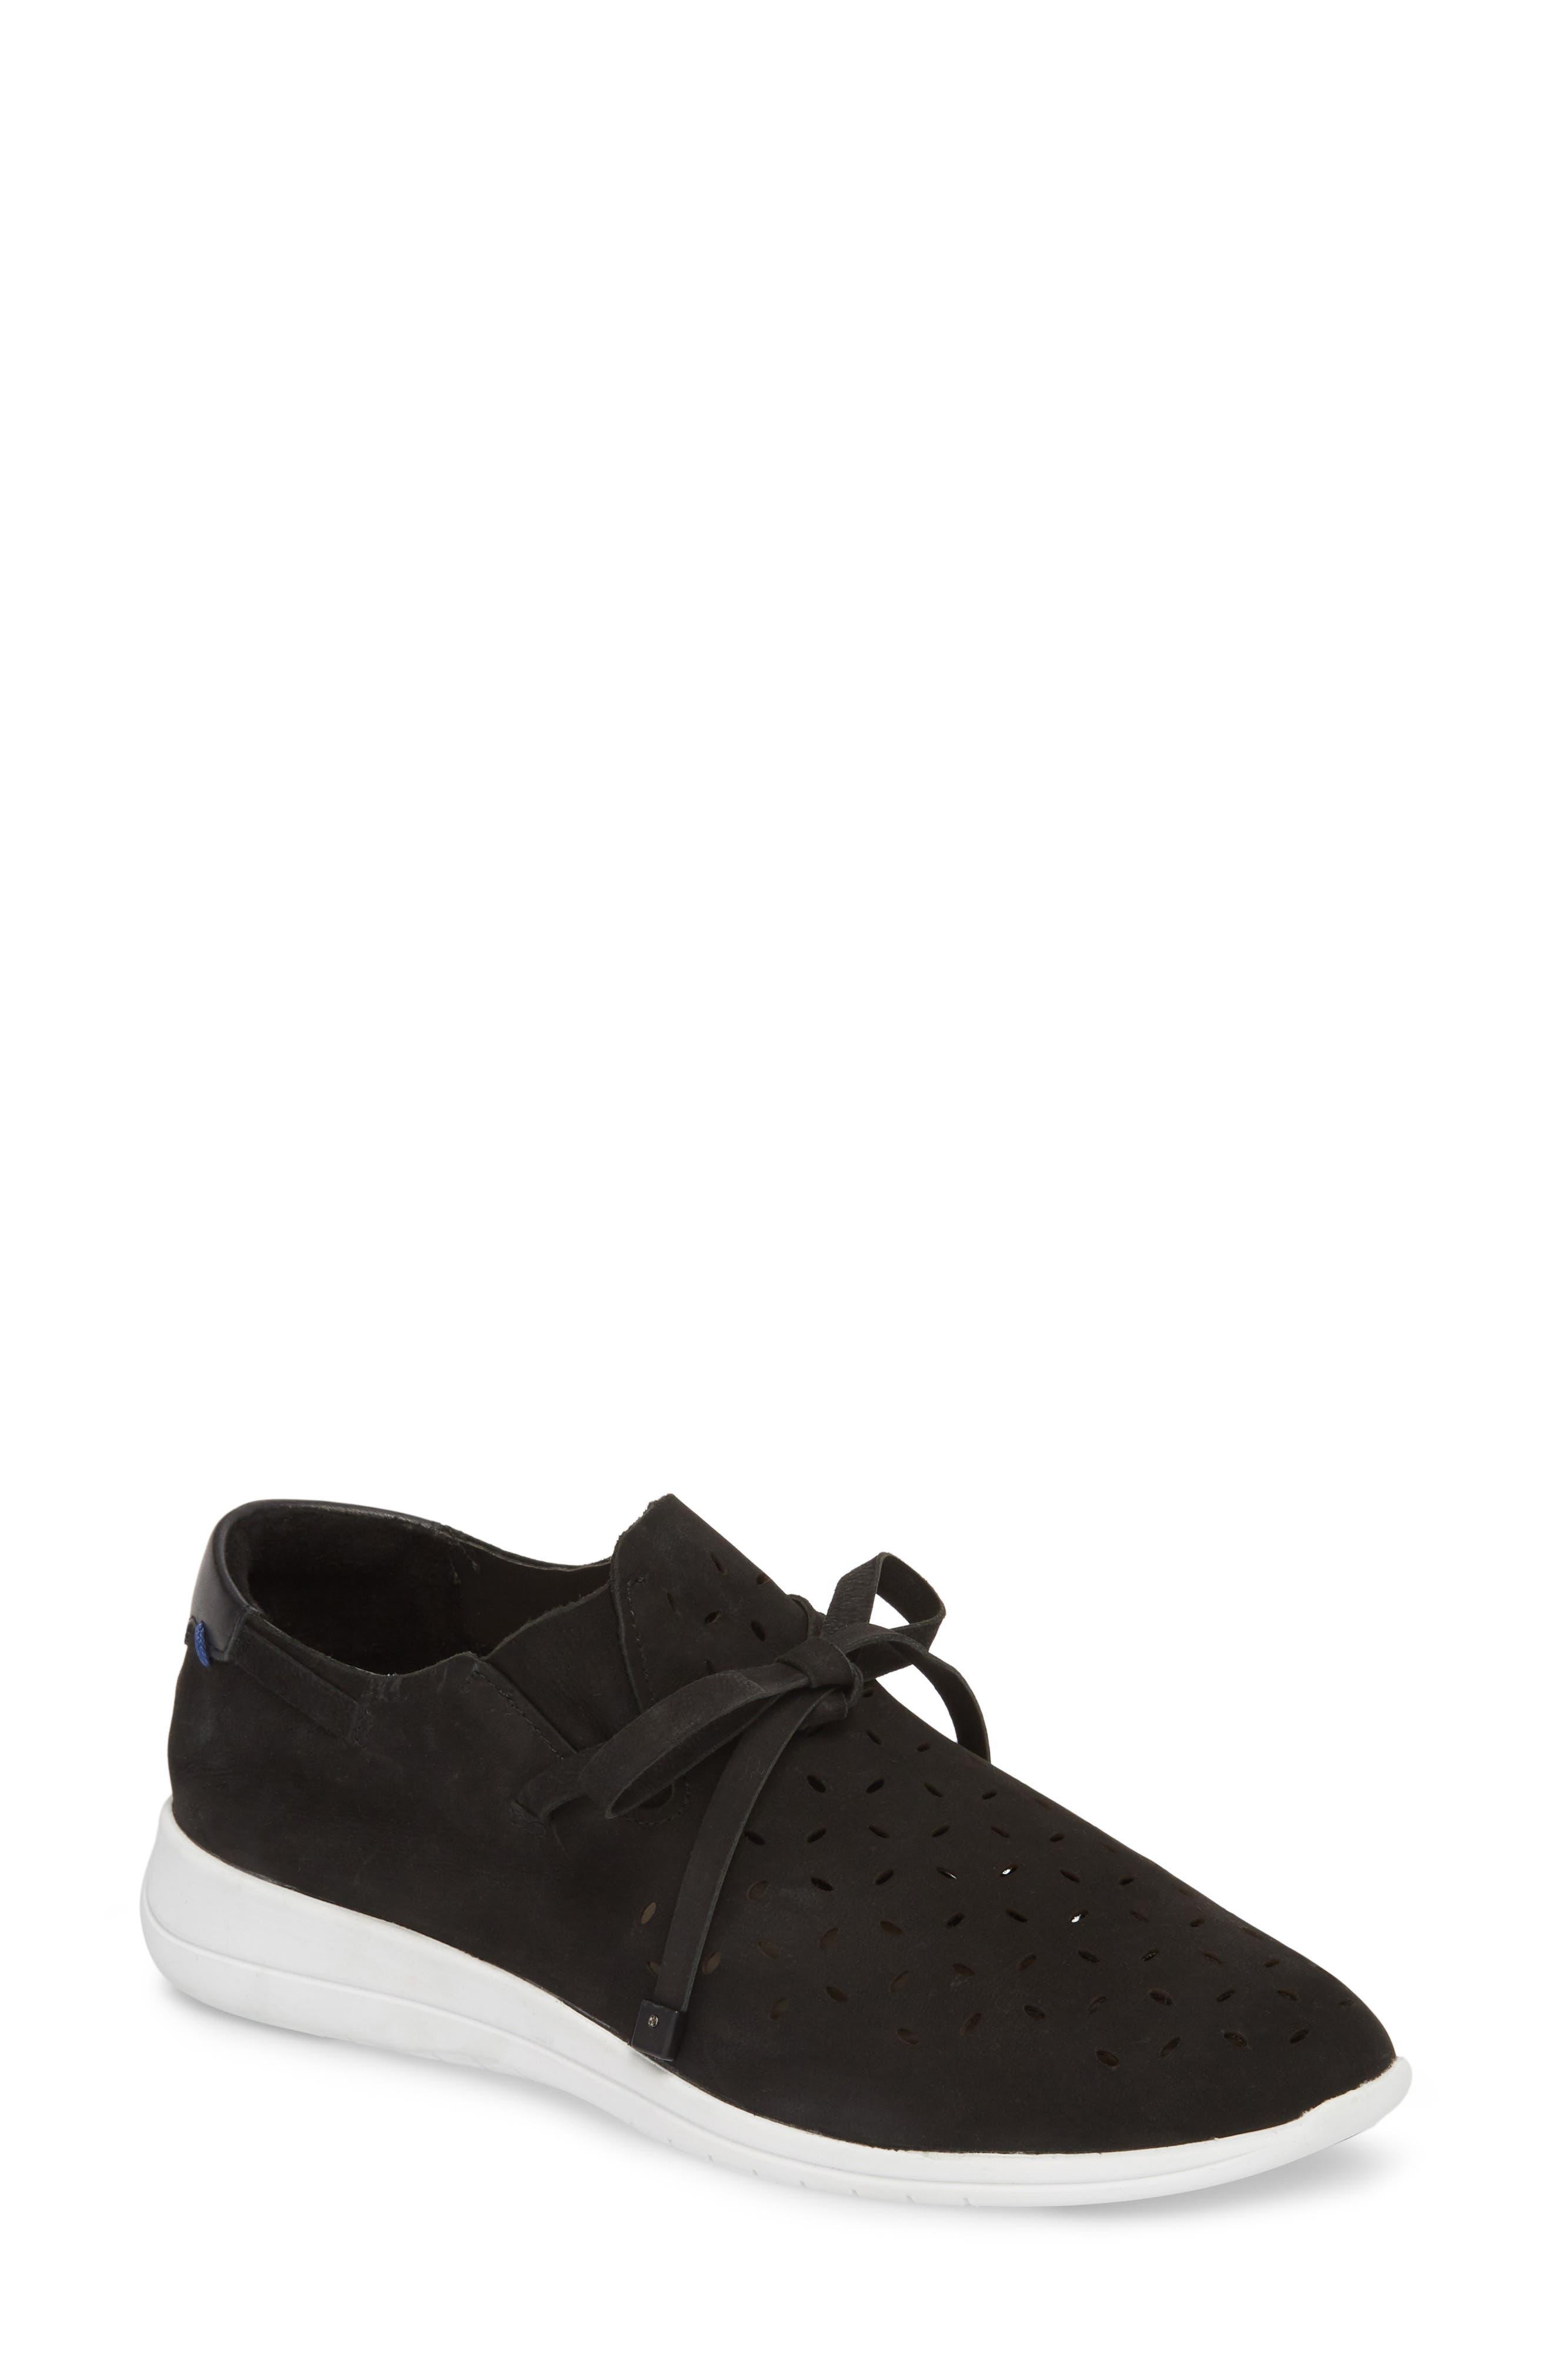 Freeport Sneaker,                             Main thumbnail 1, color,                             Black Nubuck